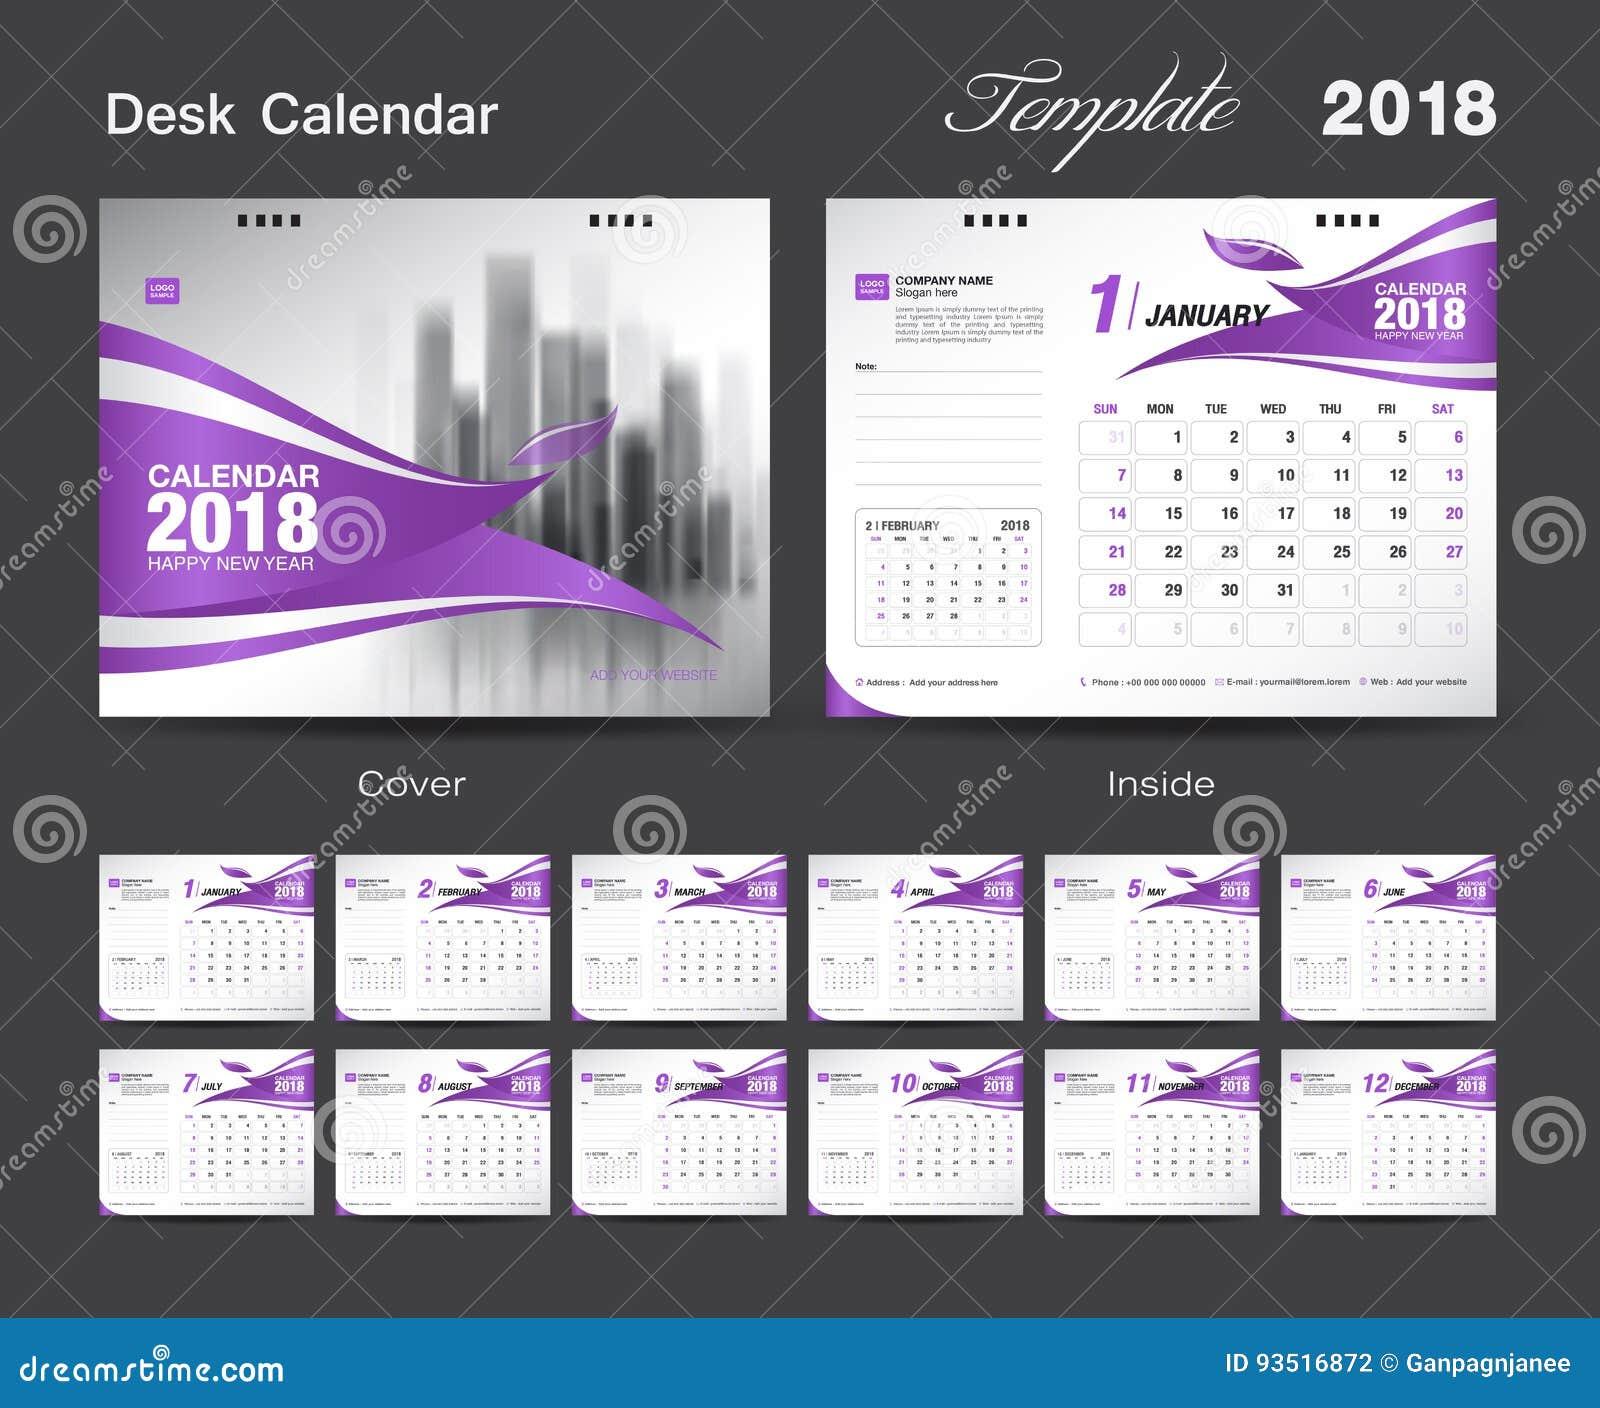 Set Desk Calendar 2018 Template Design, Red Cover Stock Vector ...